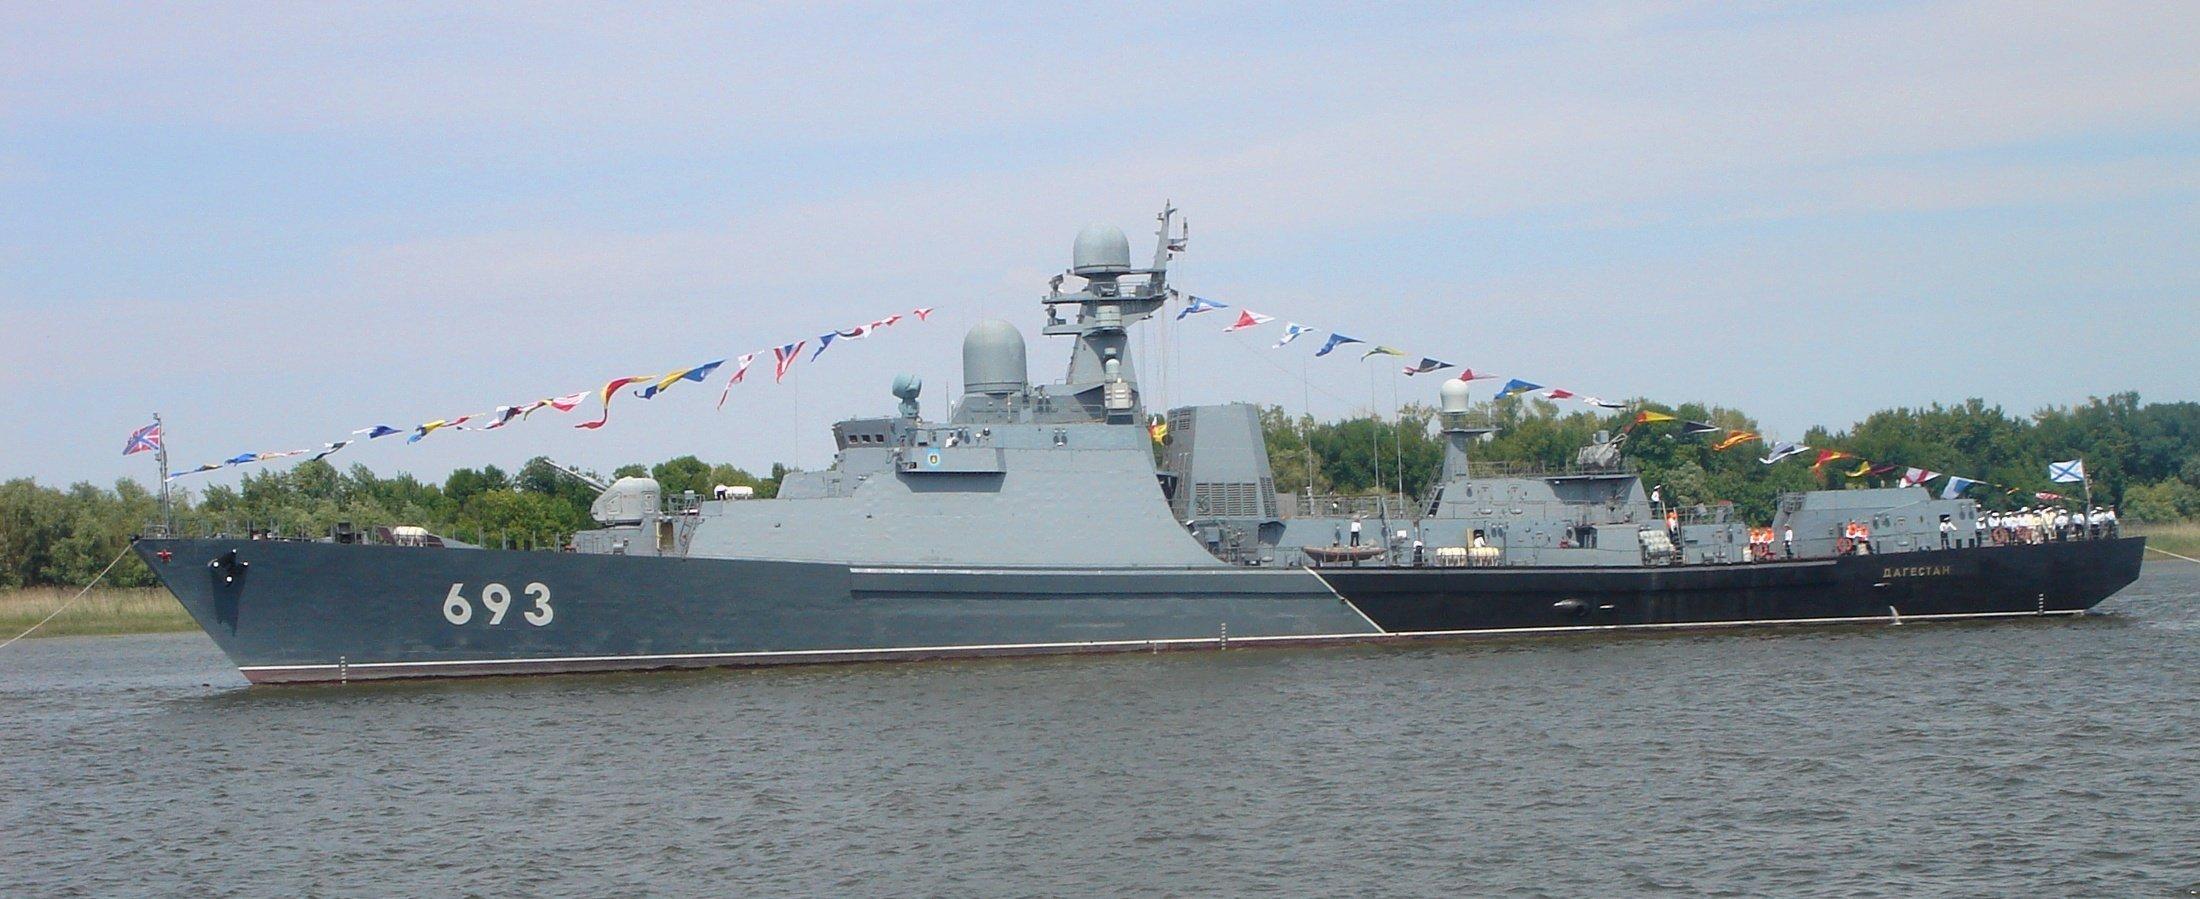 Le navire Daghestan